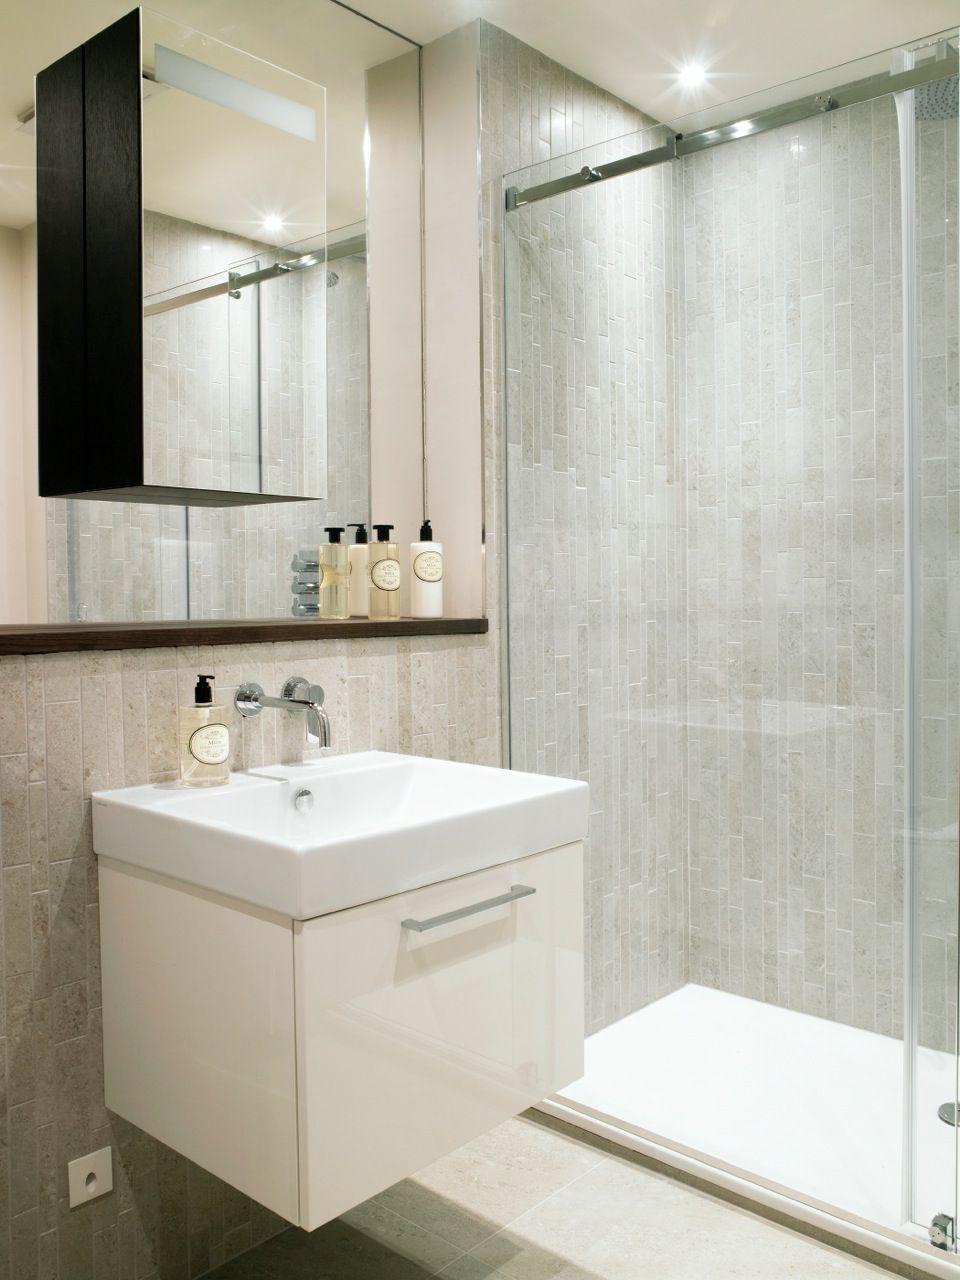 Mayfair Bachelor Pad Guest Bedroom Ensuite Shower Room  Bath room